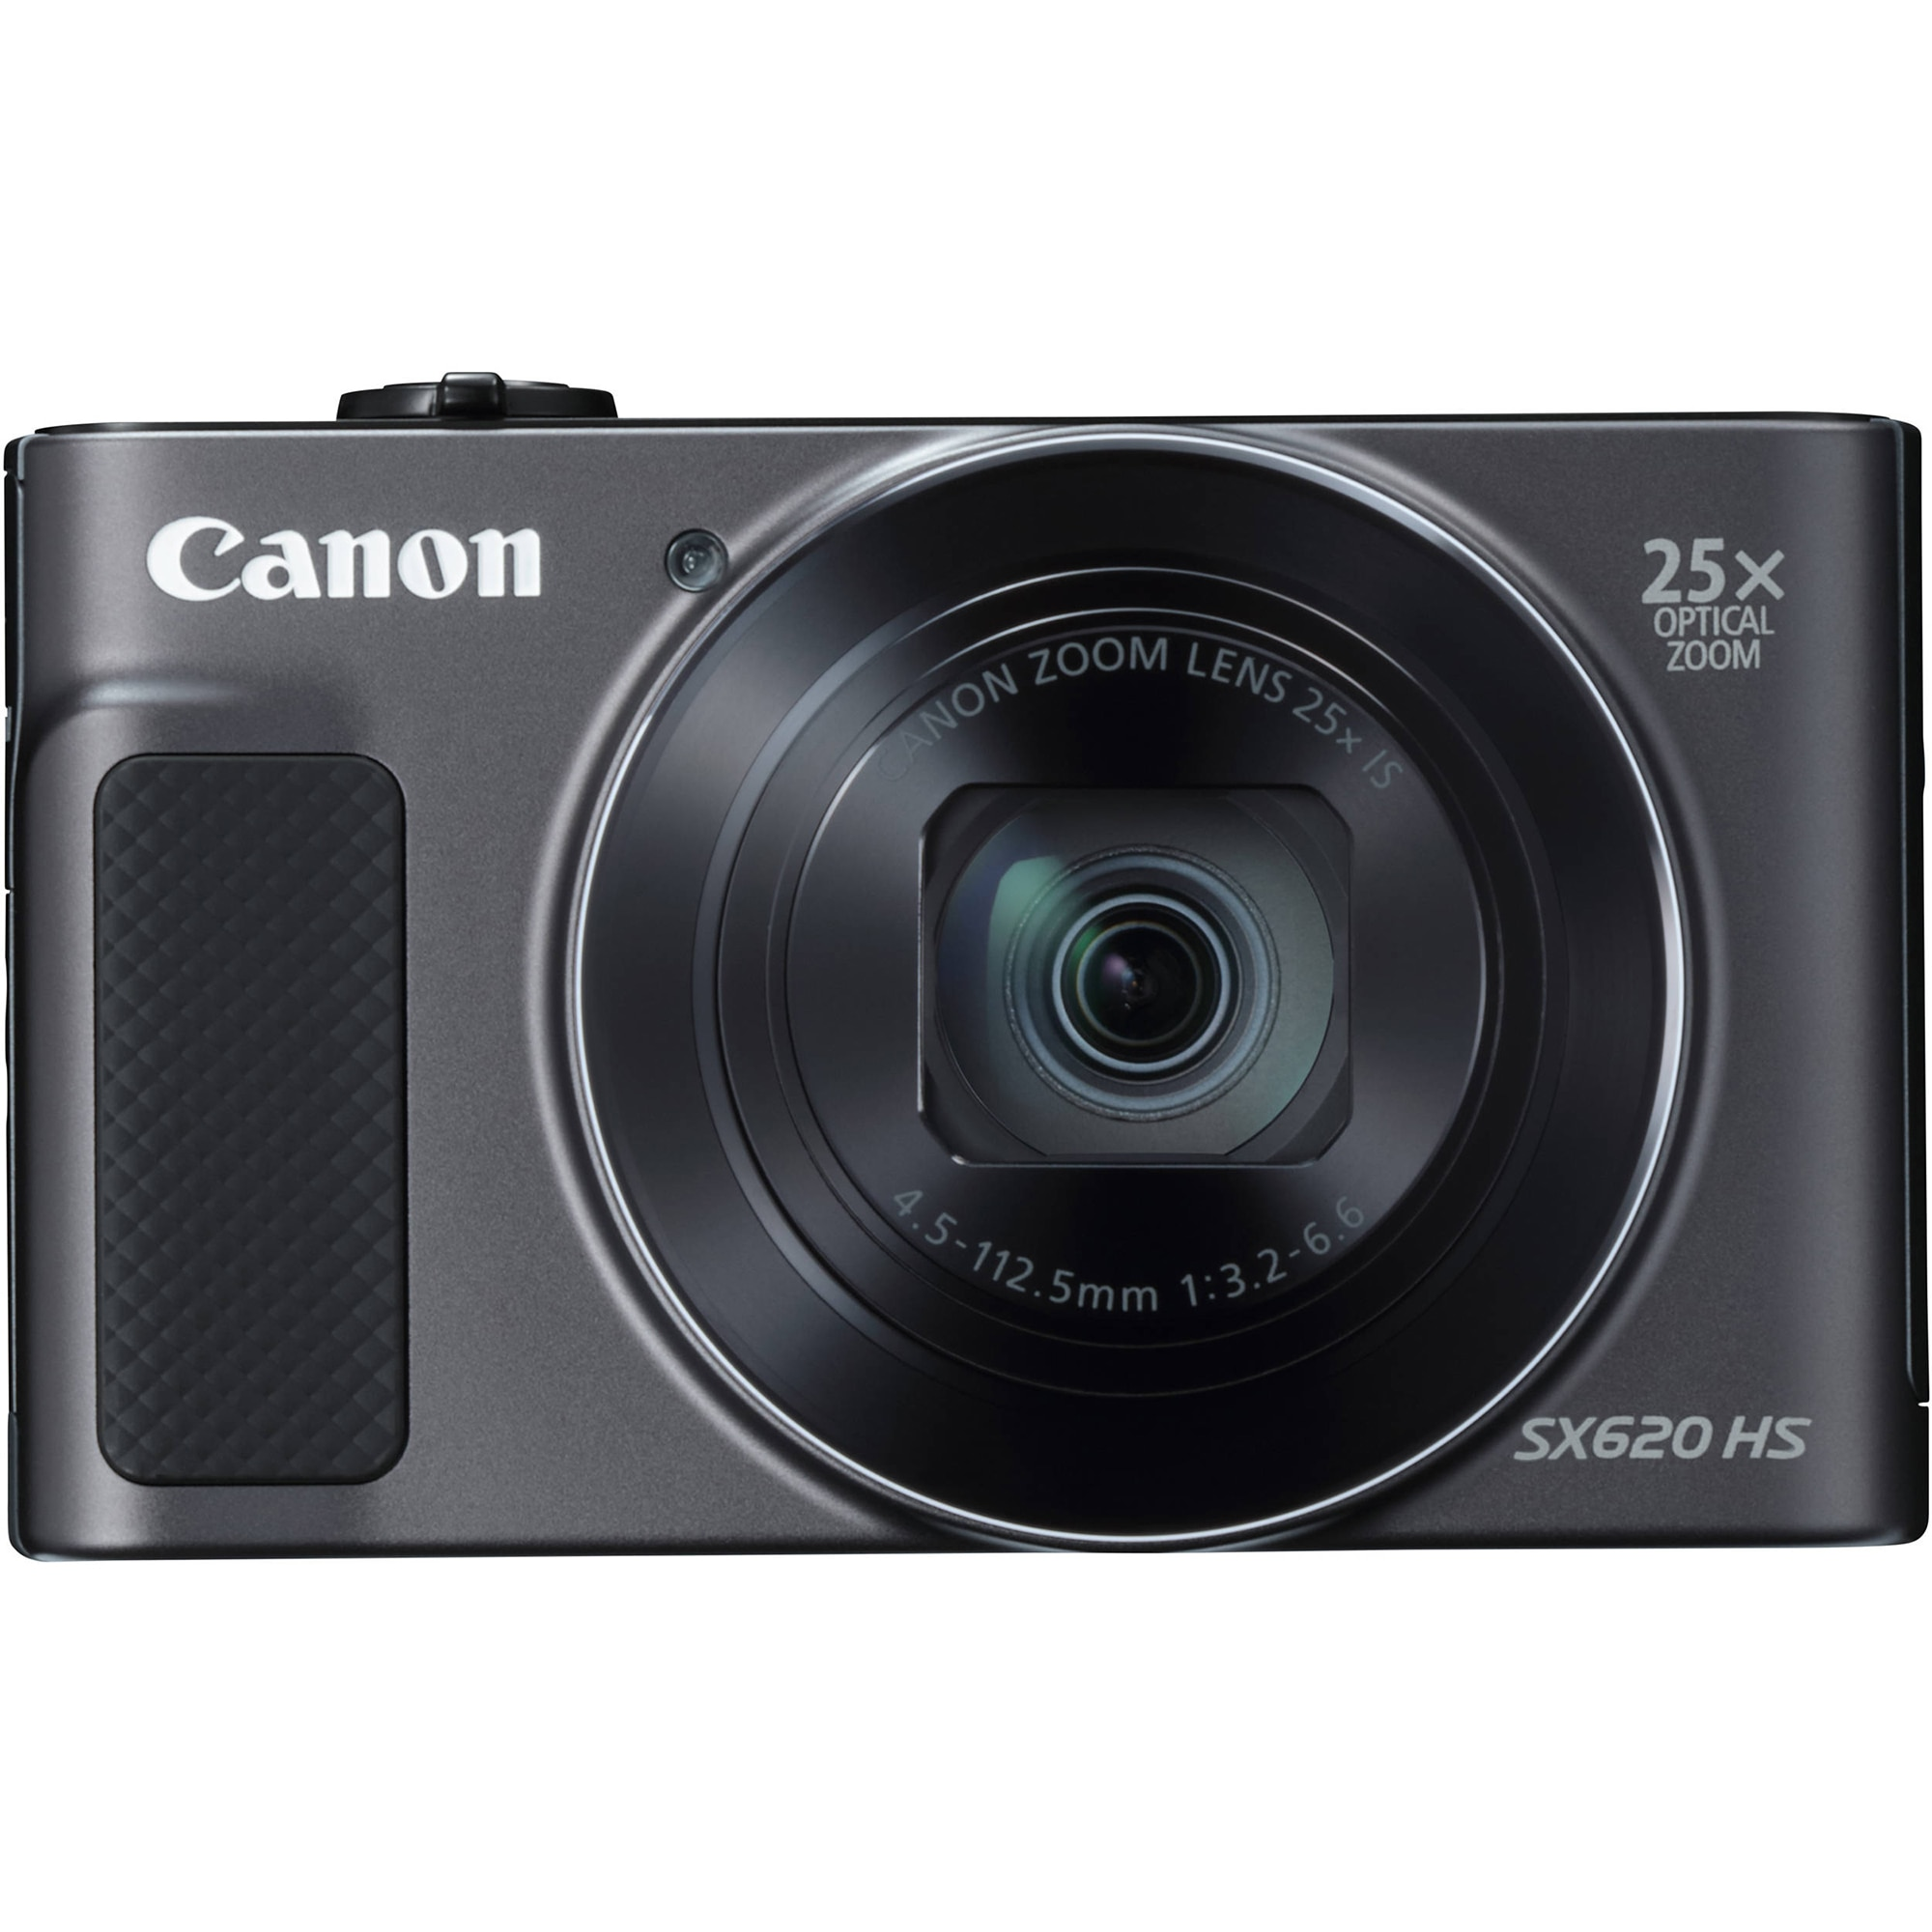 Fotografie Aparat foto digital Canon SX620HS, 20.2MP, Negru + Card de memorie 16 GB + Husa